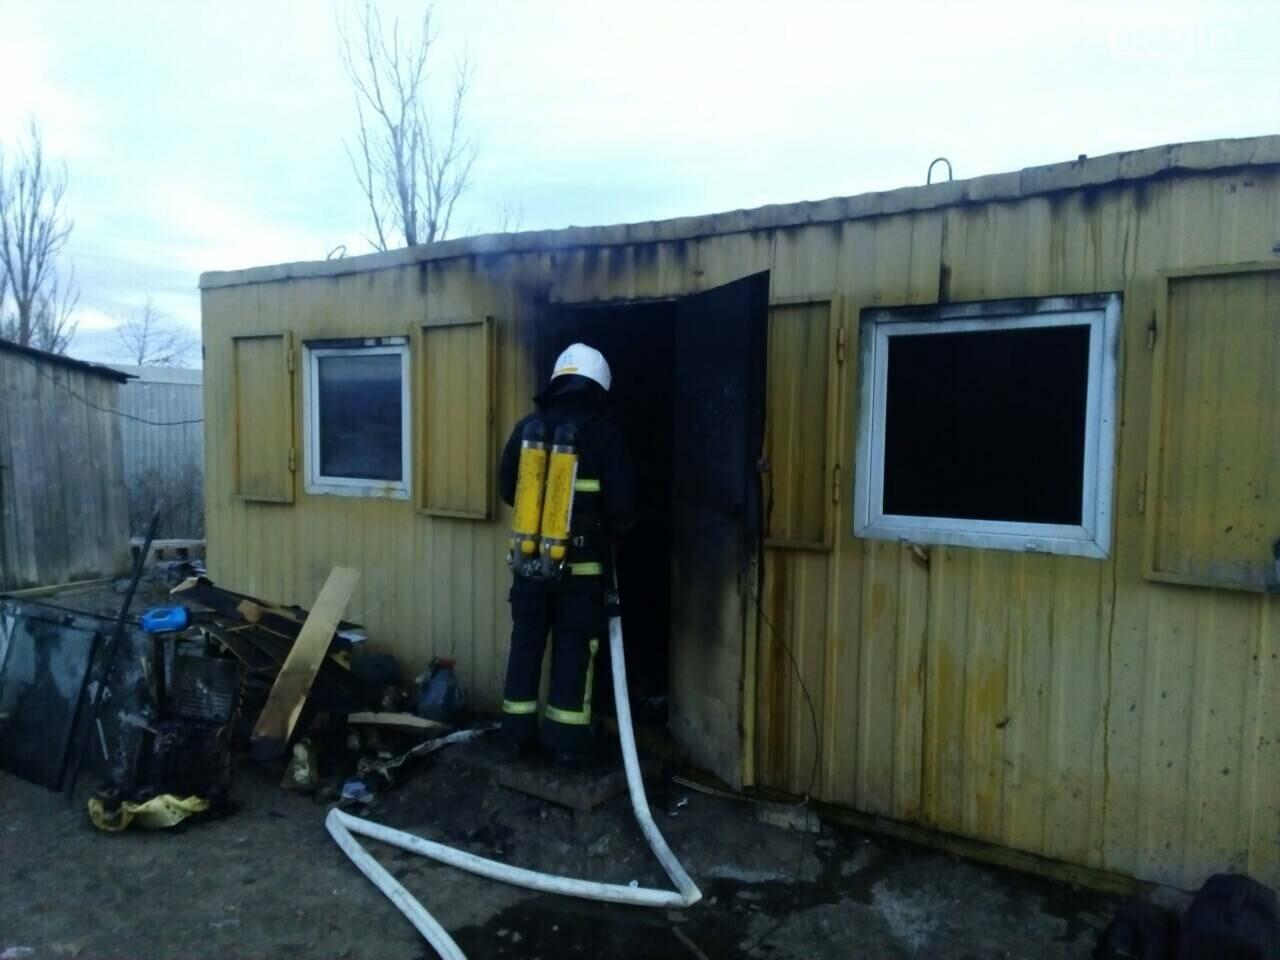 Новгородківський район: рятувальники приборкали пожежу в металевому вагончику, фото-1